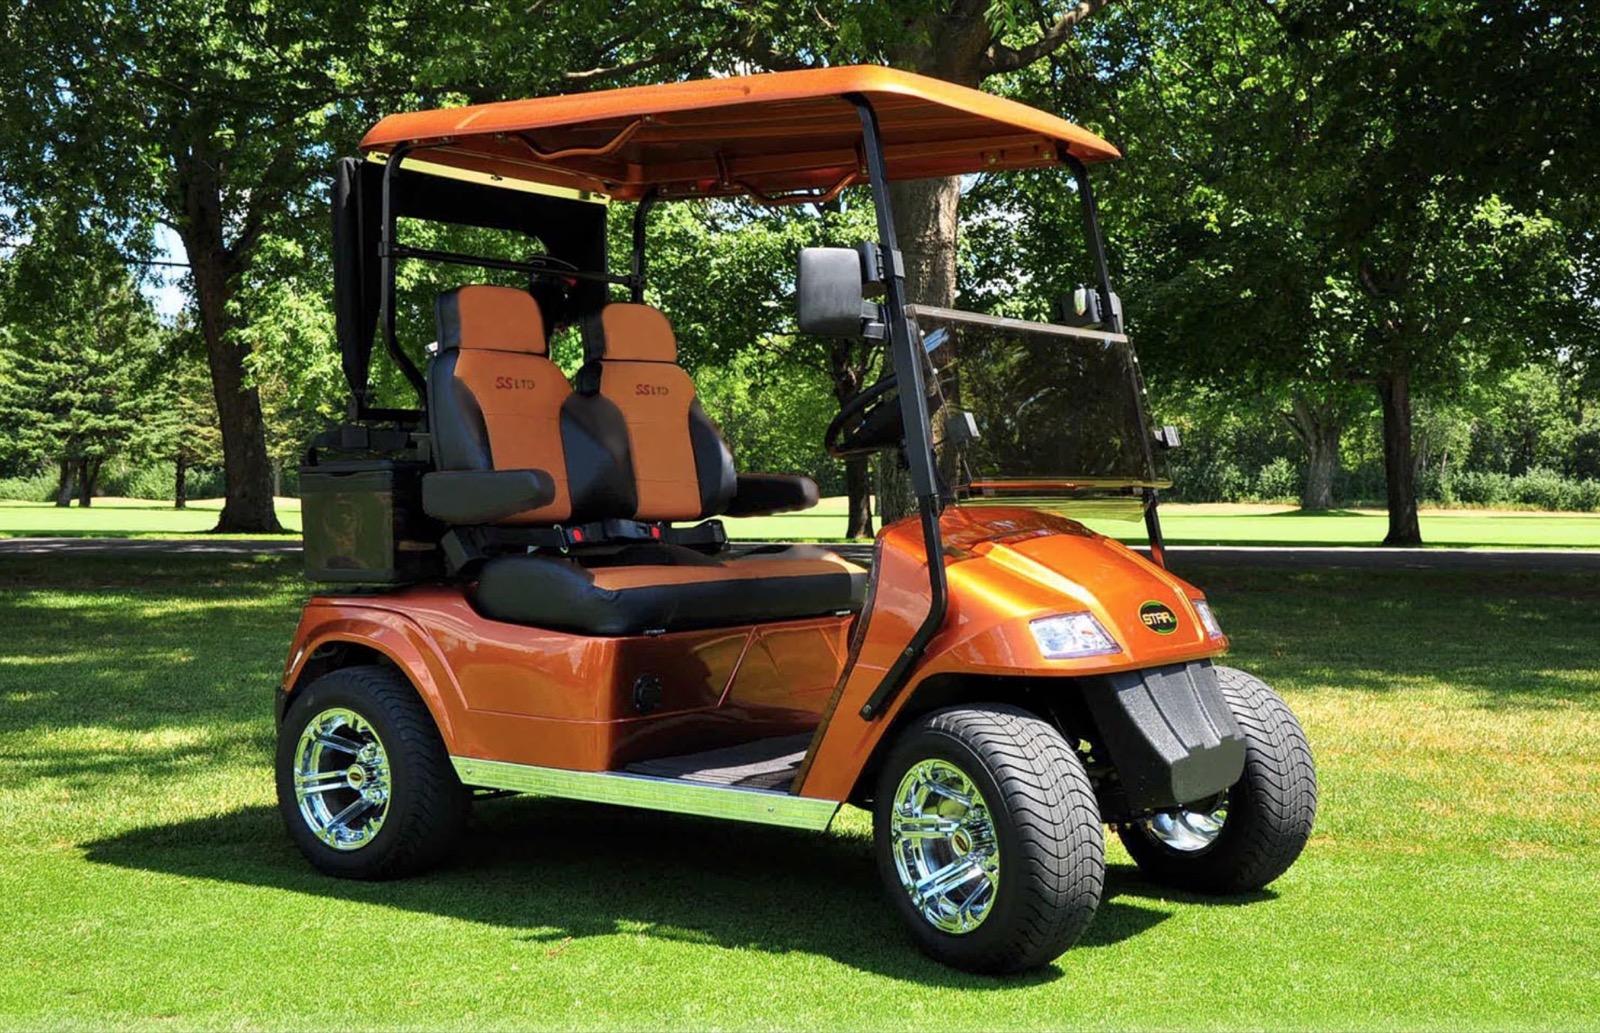 STAR Street Legal Carts - Golf Carts Mobile AL | Golf Carts ... on golf card, golf gear, golf games, golf shafts, golf hitting nets, golf buggy, golf equipment, golf machine, go kart, golf club set, golf trolley, golf accessories, golf players, golf putters, golf tools, golf words, golf cartoons, golf drivers, golf handicap, golf tips, golf ball, golf irons, go cart, golf swing, golf trolleys, golf tees, golf car, golf apparel, golf bag,